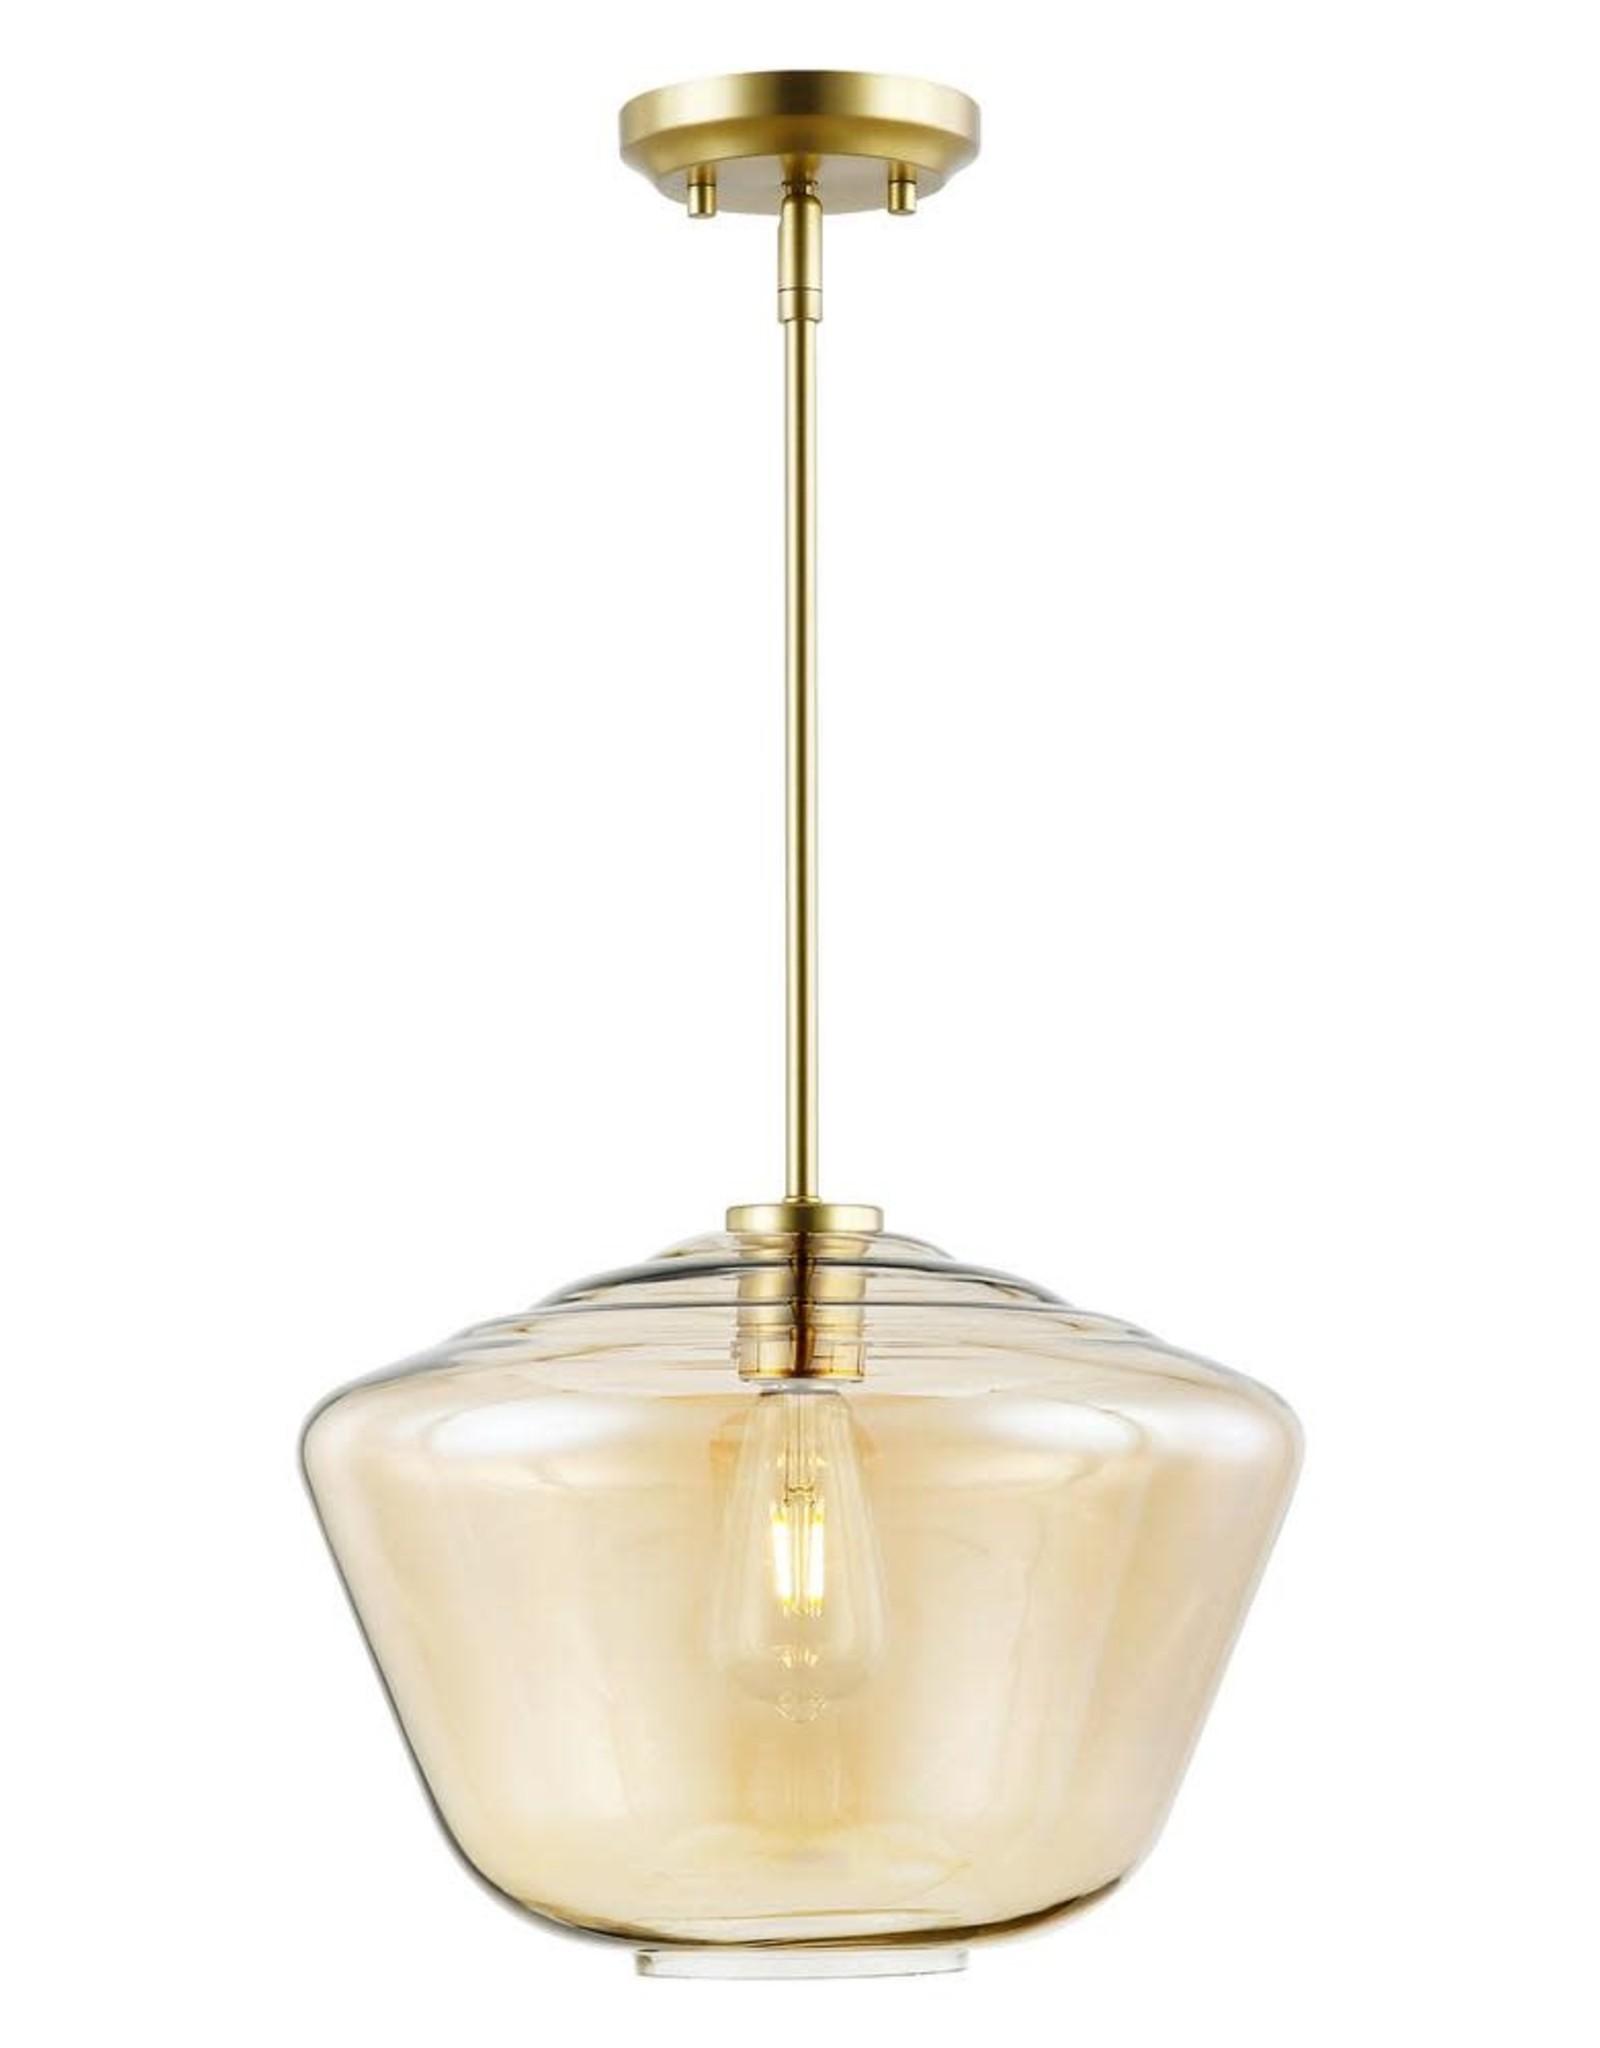 Light Society Vera 1-Light Brushed Brass Pendant Light with Amber Glass Shade